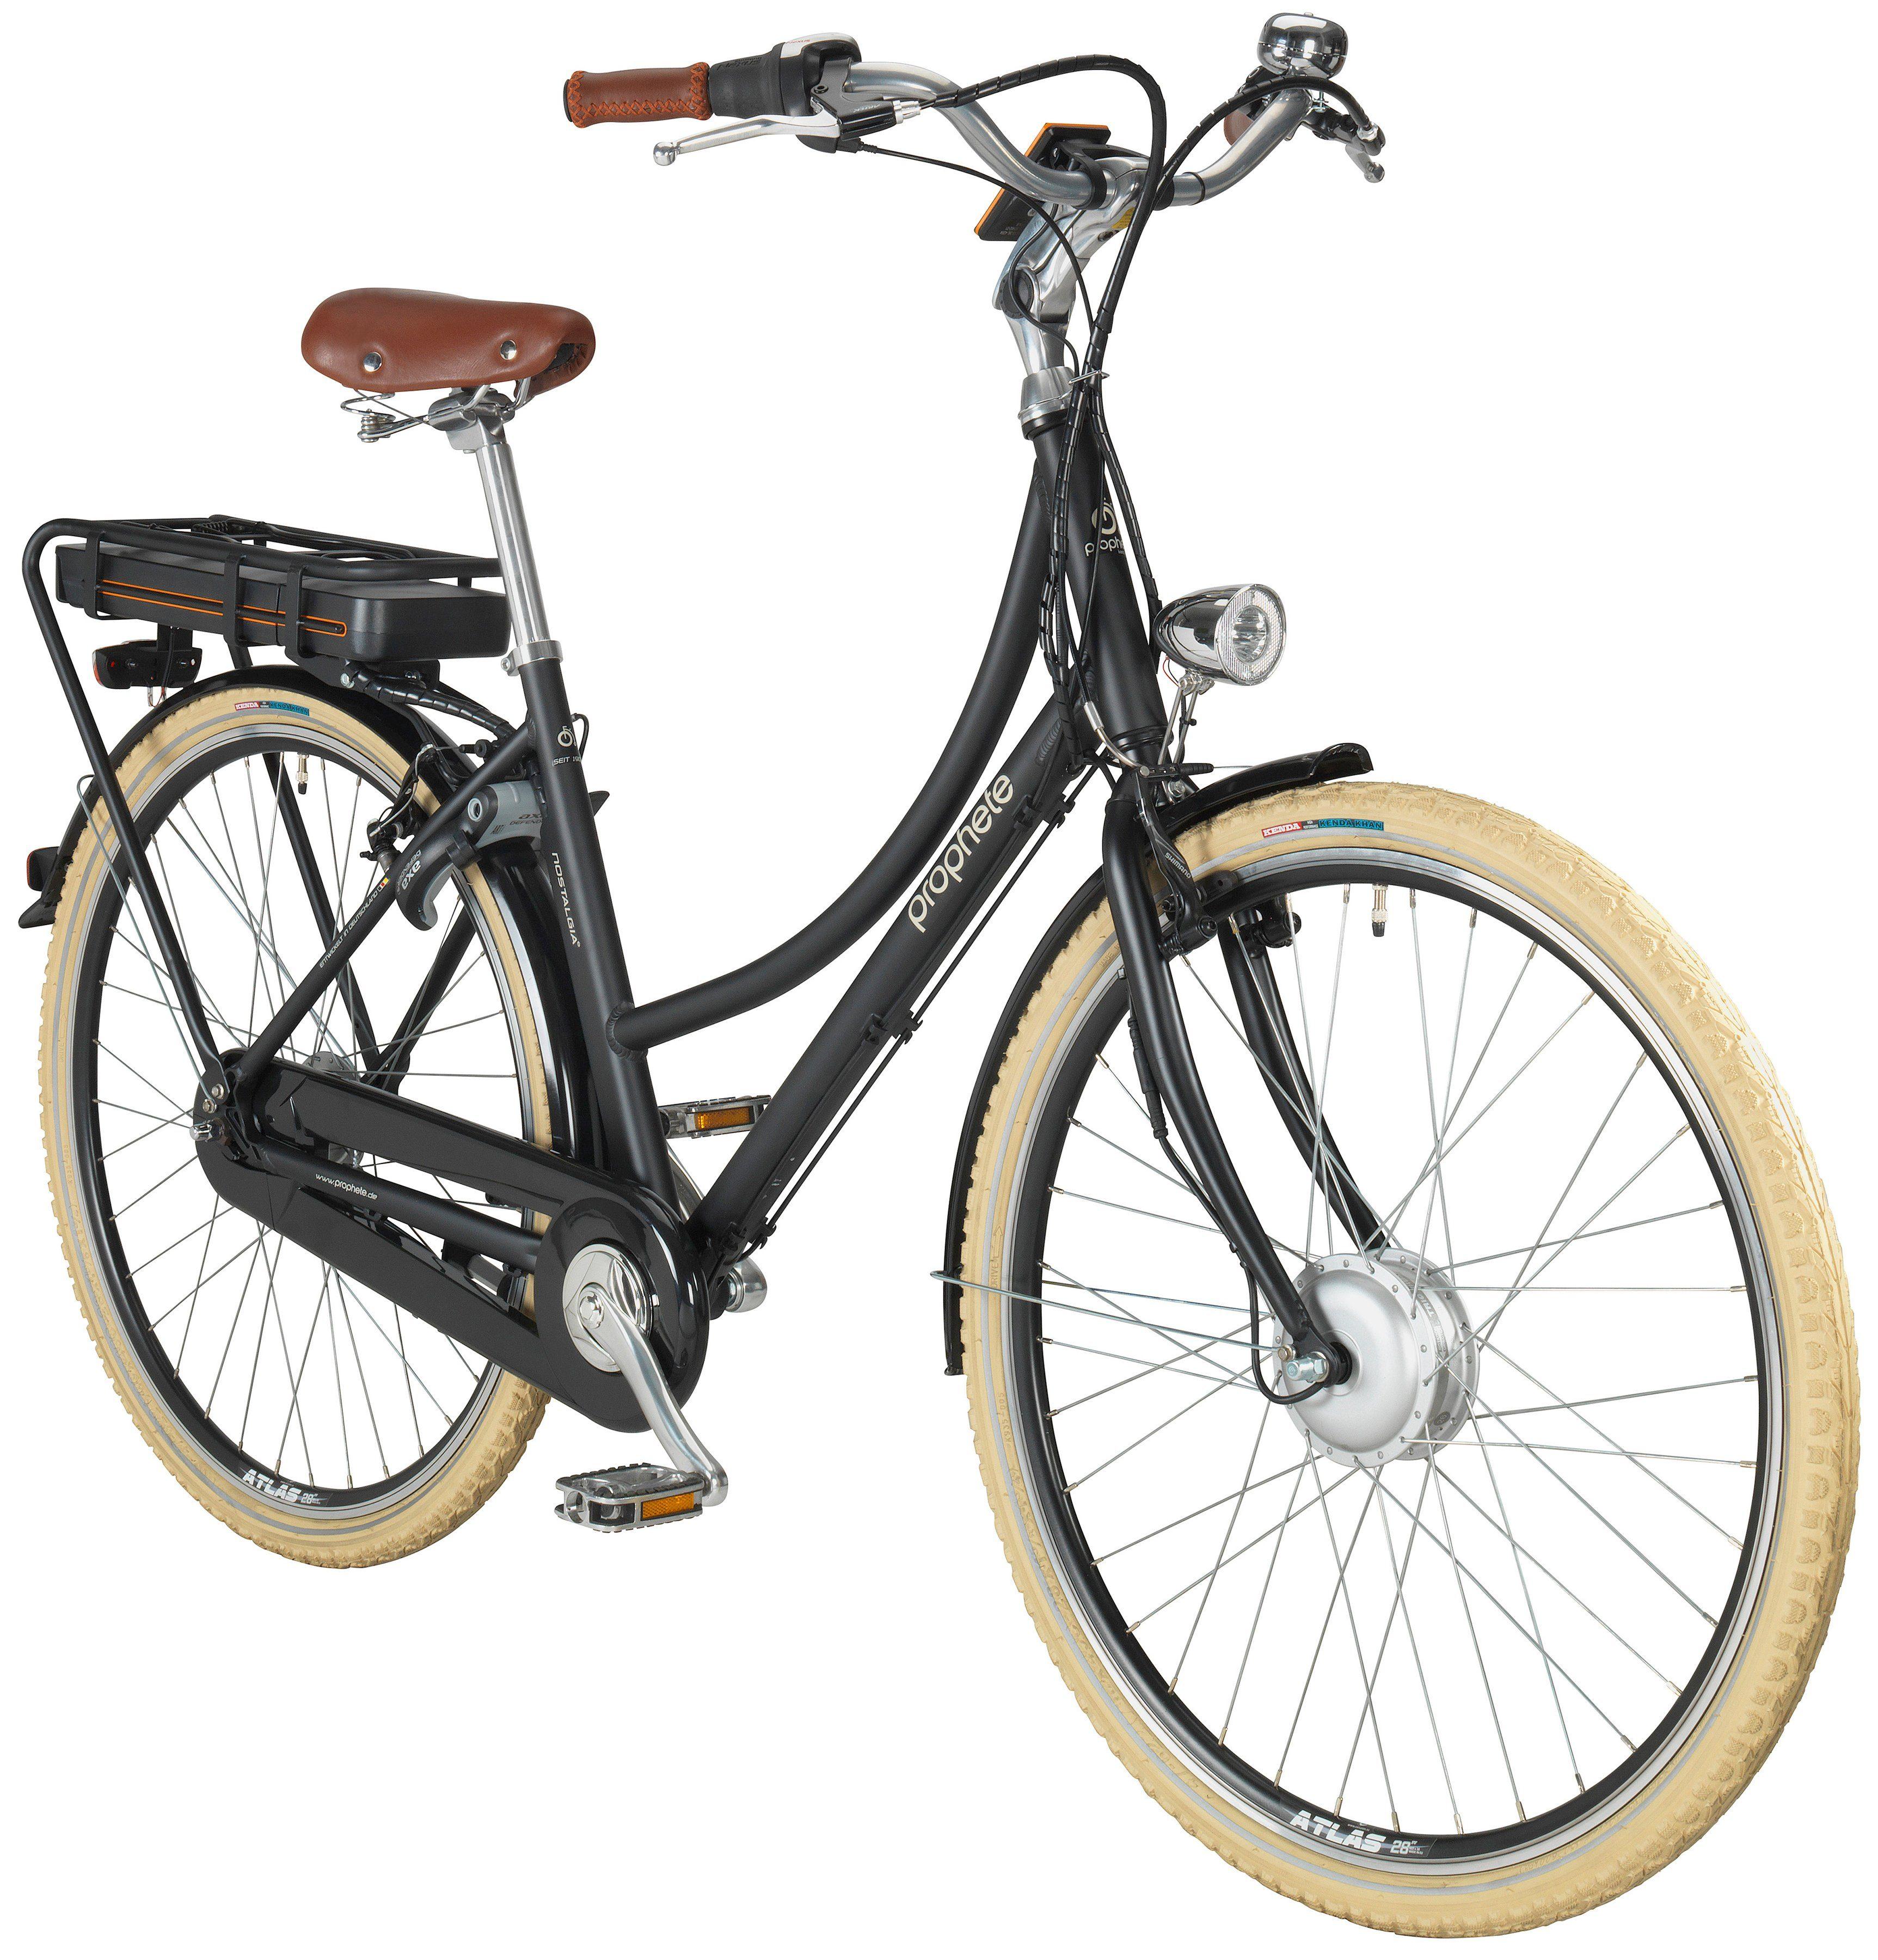 PROPHETE E-Bike Hollandrad »Nostalgia e«, 28 Zoll, 8-Gang, Frontmotor, 374 Wh